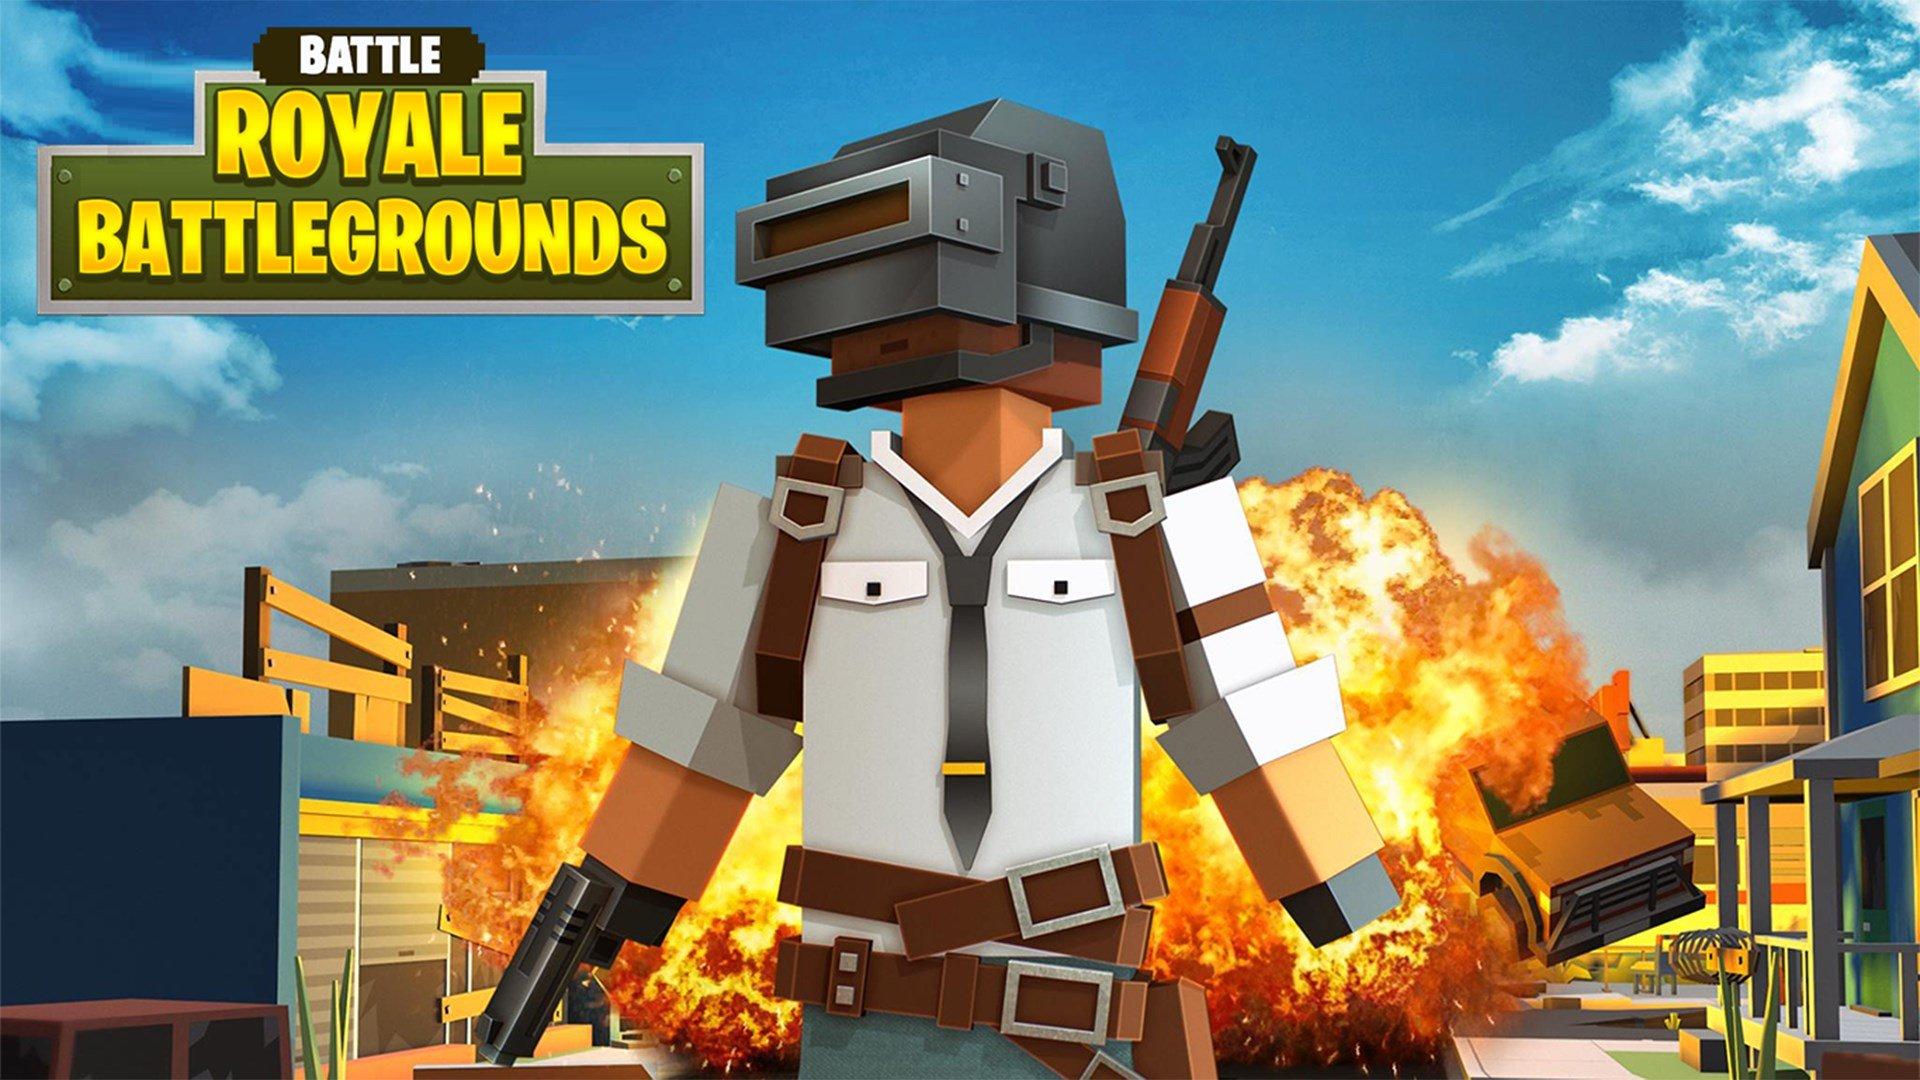 10 Best Offline Battle Royale Games For Android 2020